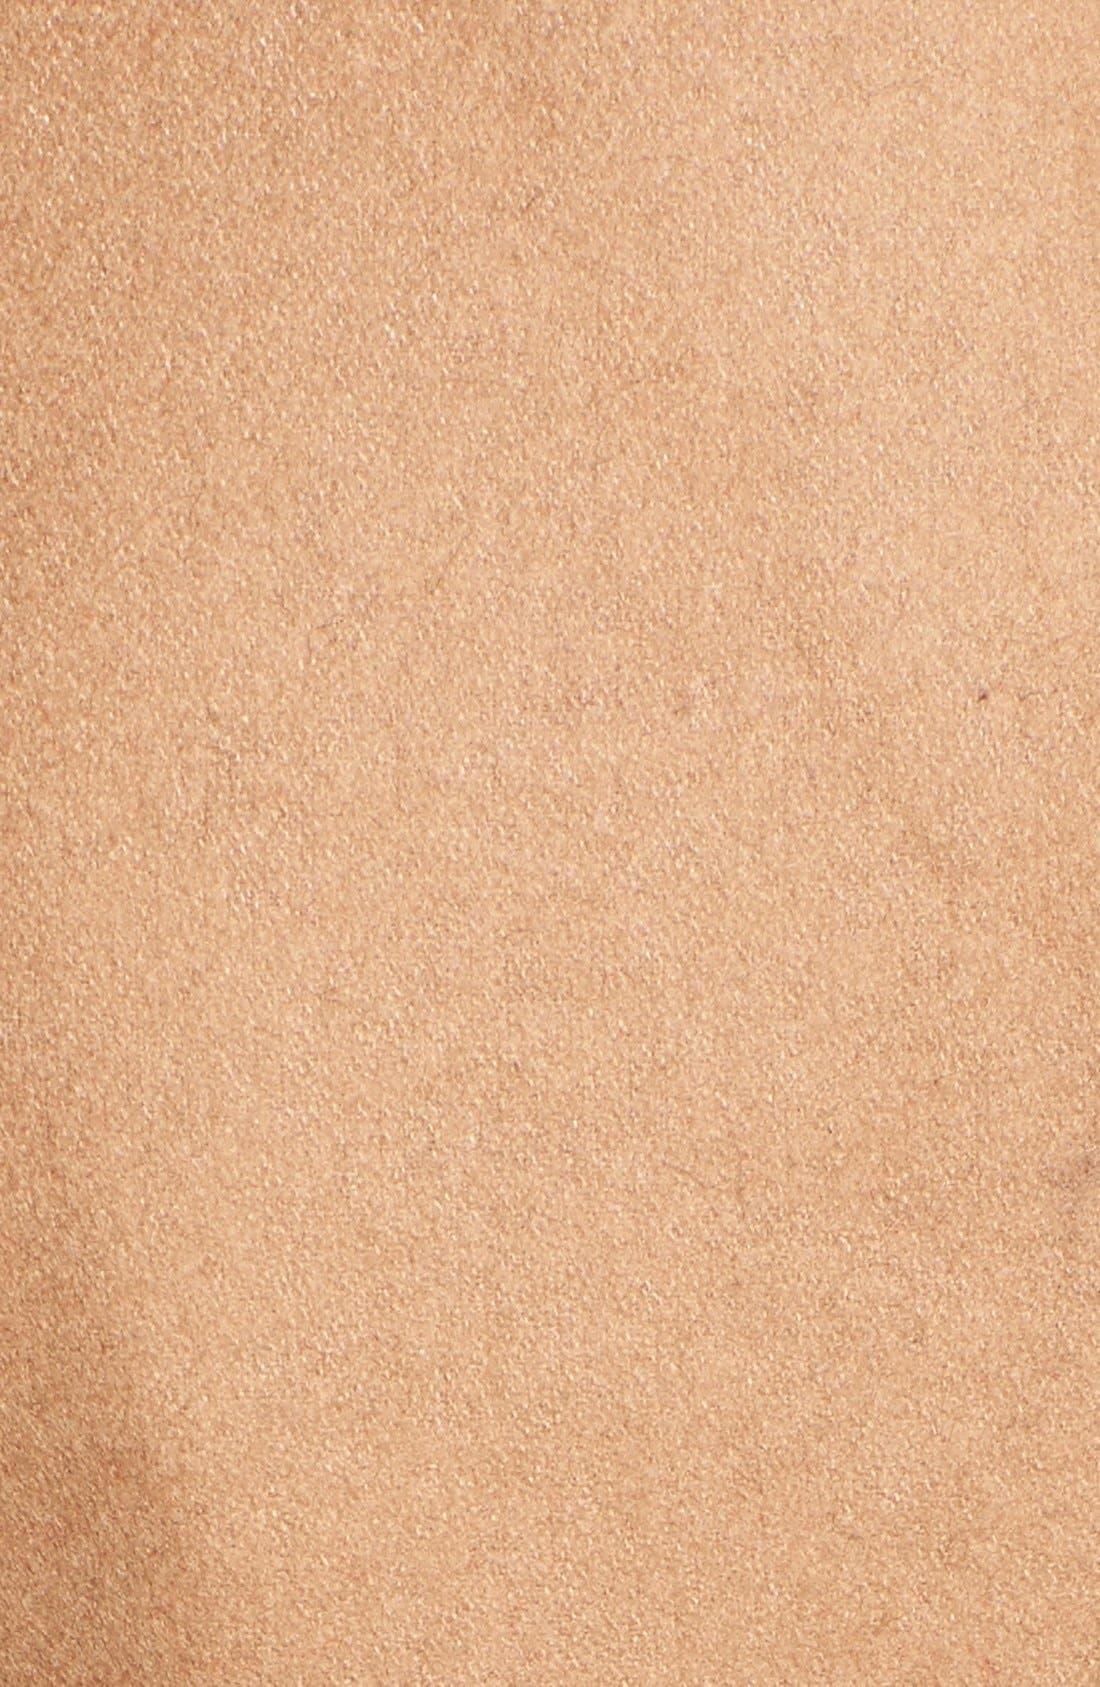 Faux Leather & Faux Fur Trim Belted Wool Blend Coat,                             Alternate thumbnail 37, color,